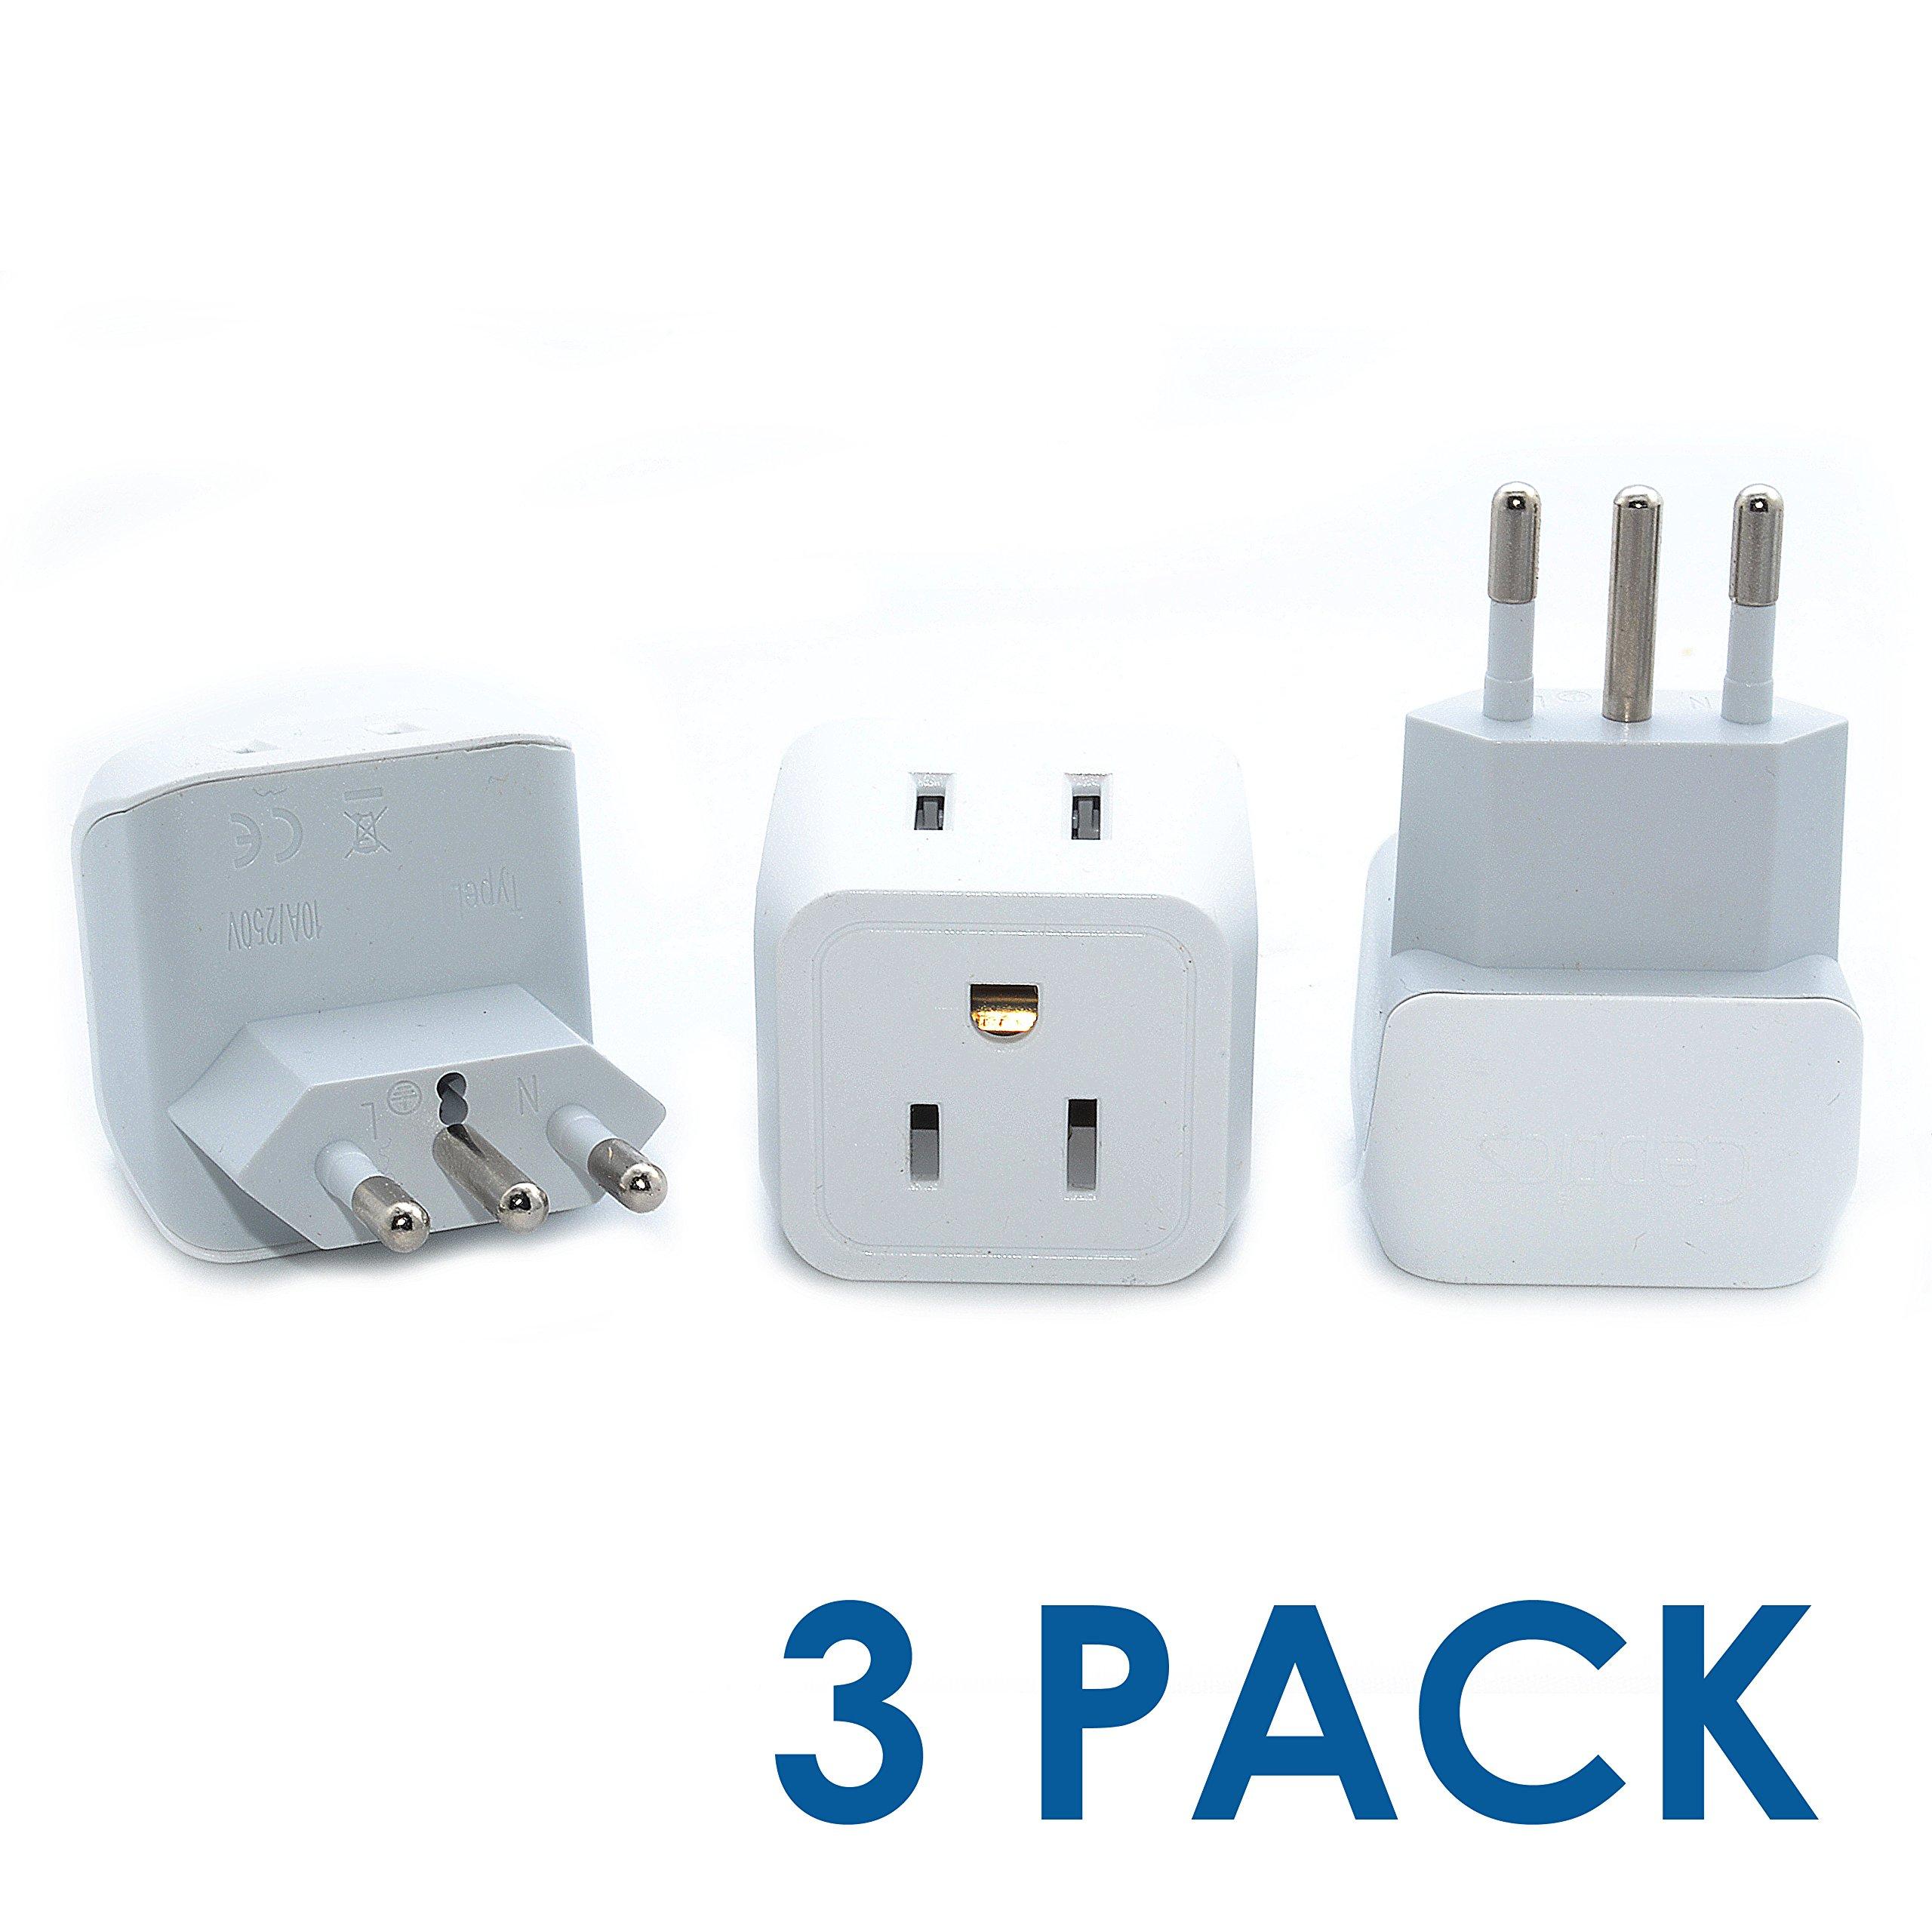 ACA1007 Italy to USA Travel Plug Adapter; Adapts an Italy CEI 23-50 Device into a USA NEMA 5-15 Inlet